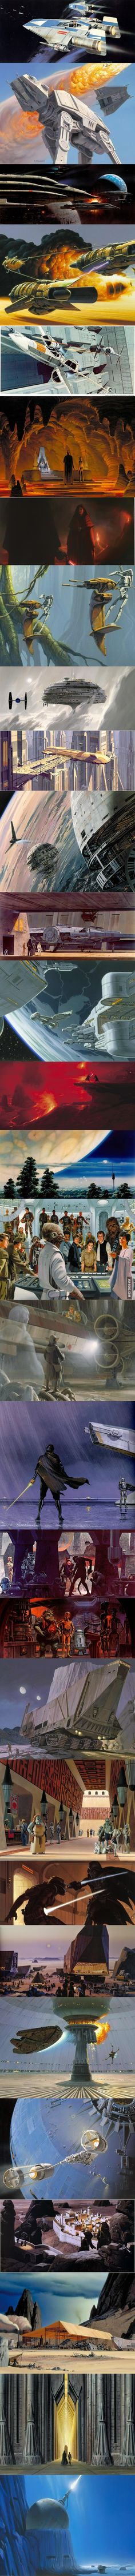 High resolution Star Wars concept art